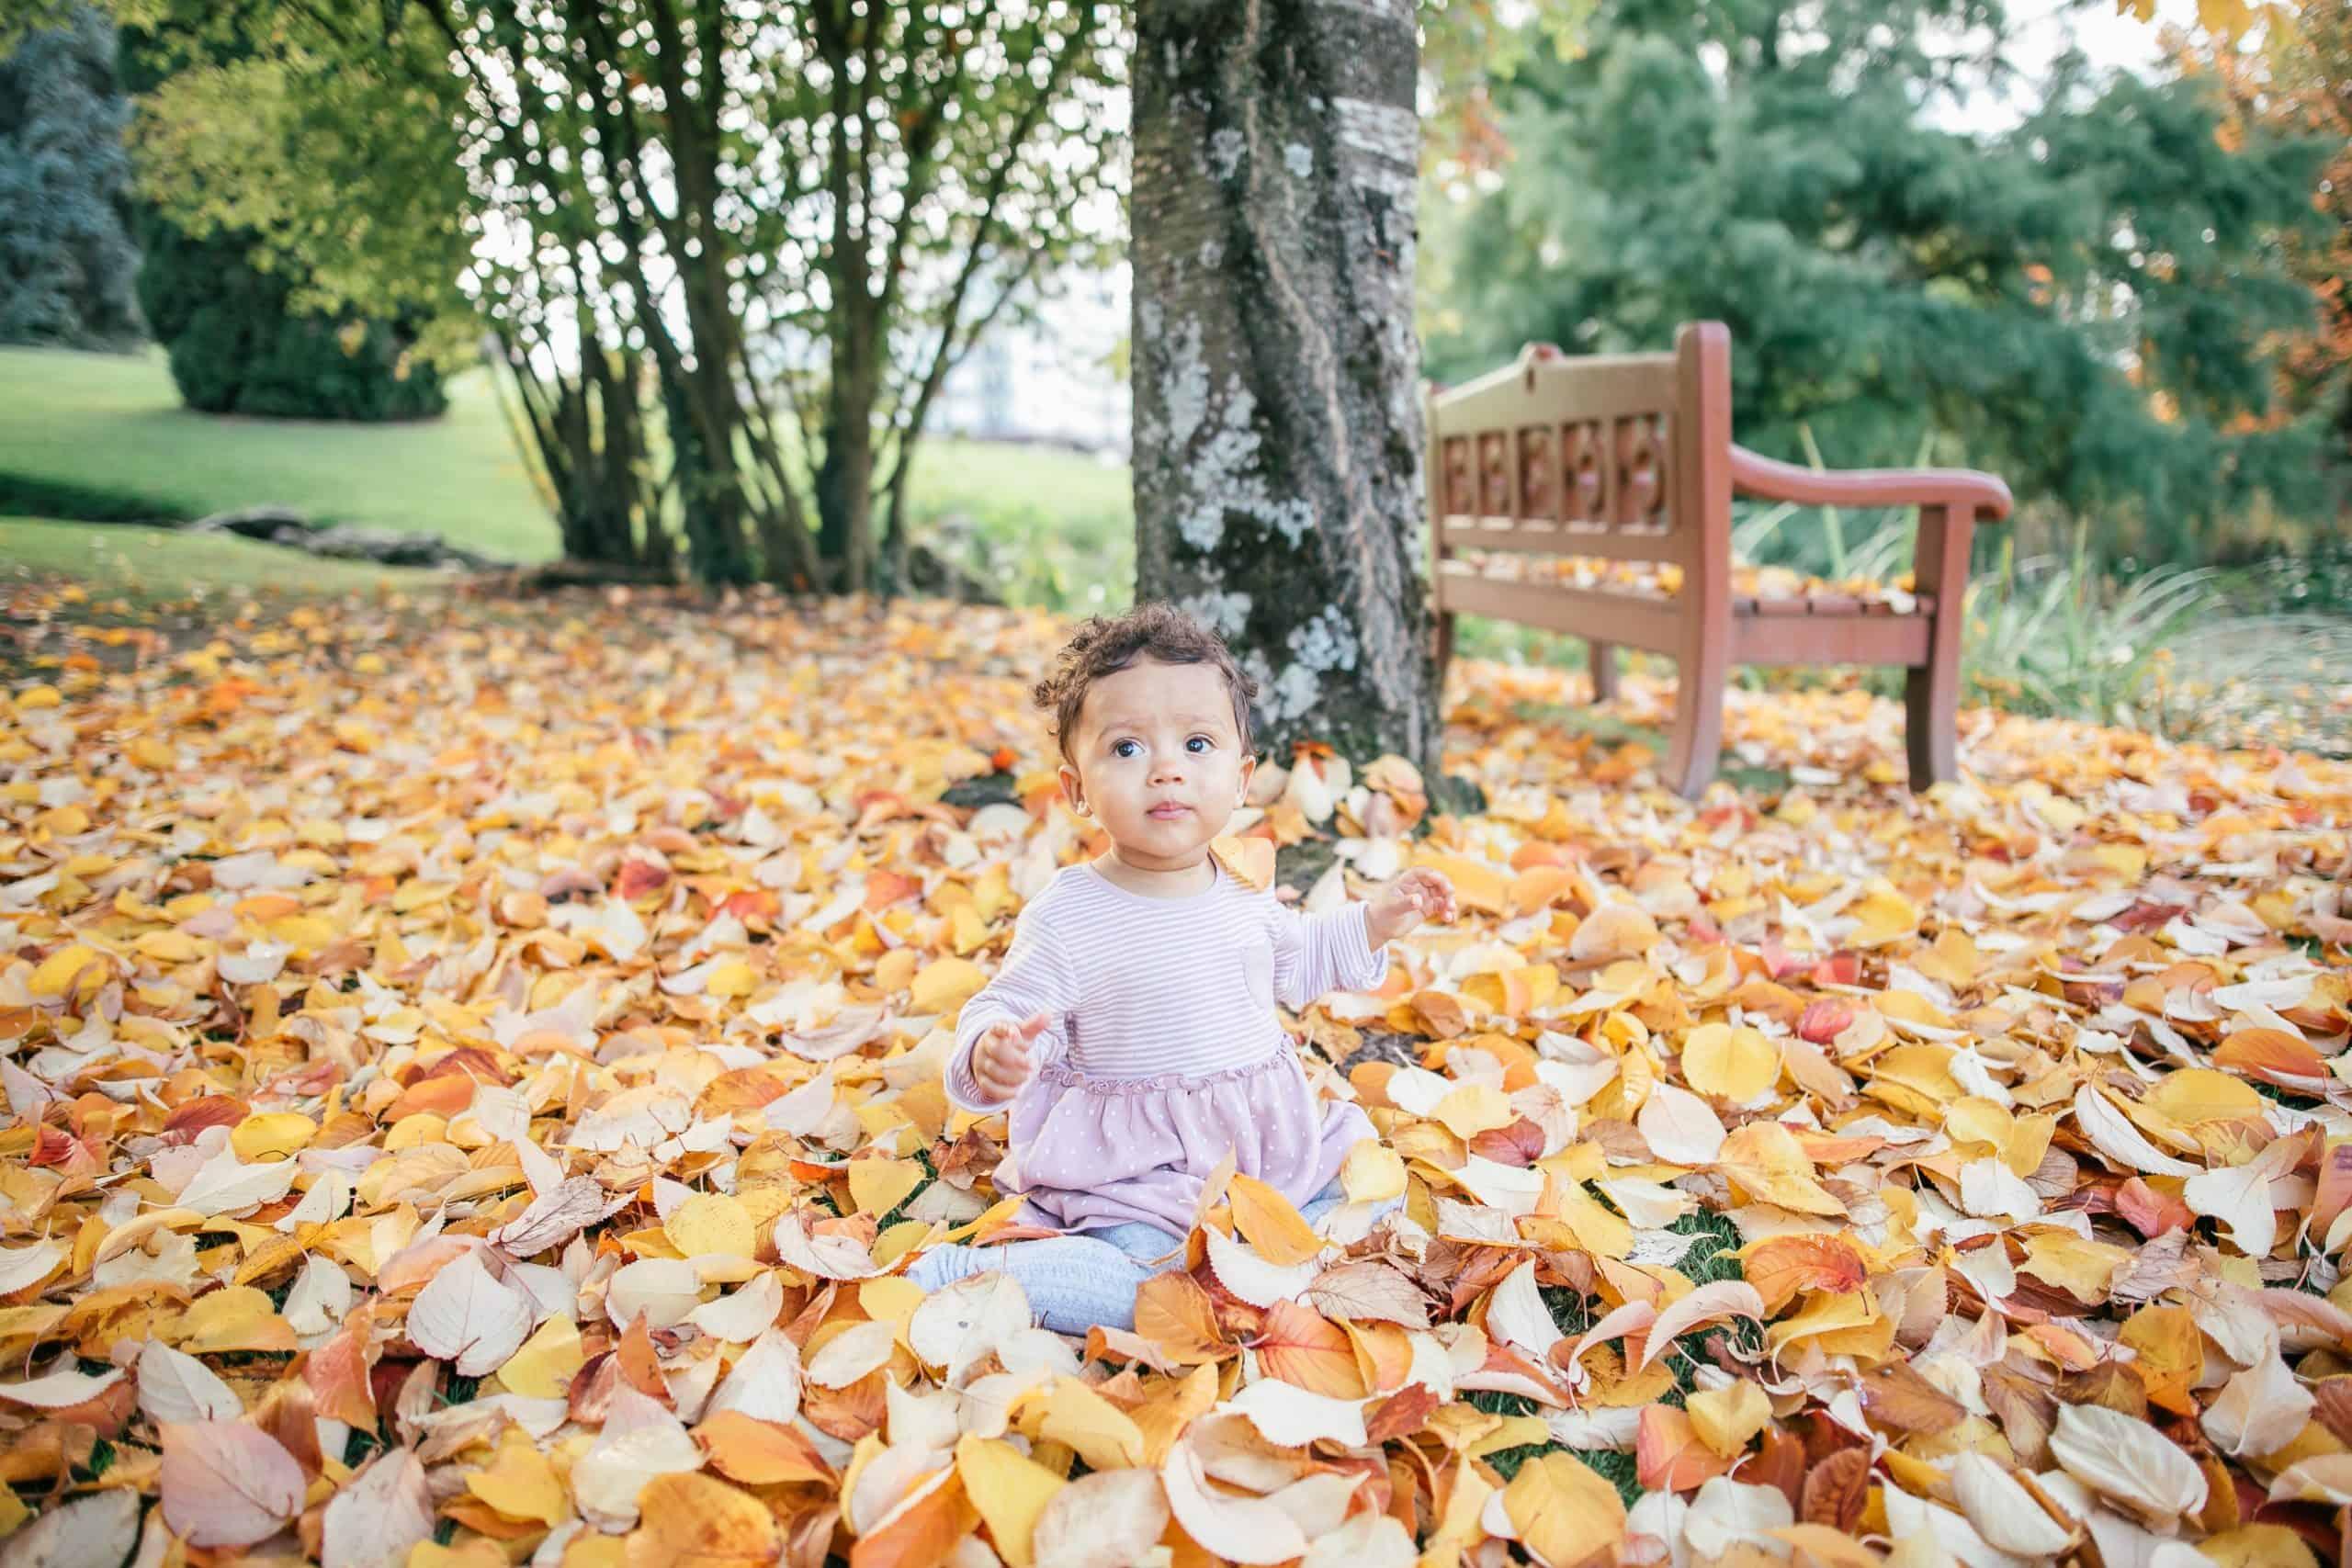 humphrey-muleba-child in leaf pile-unsplash